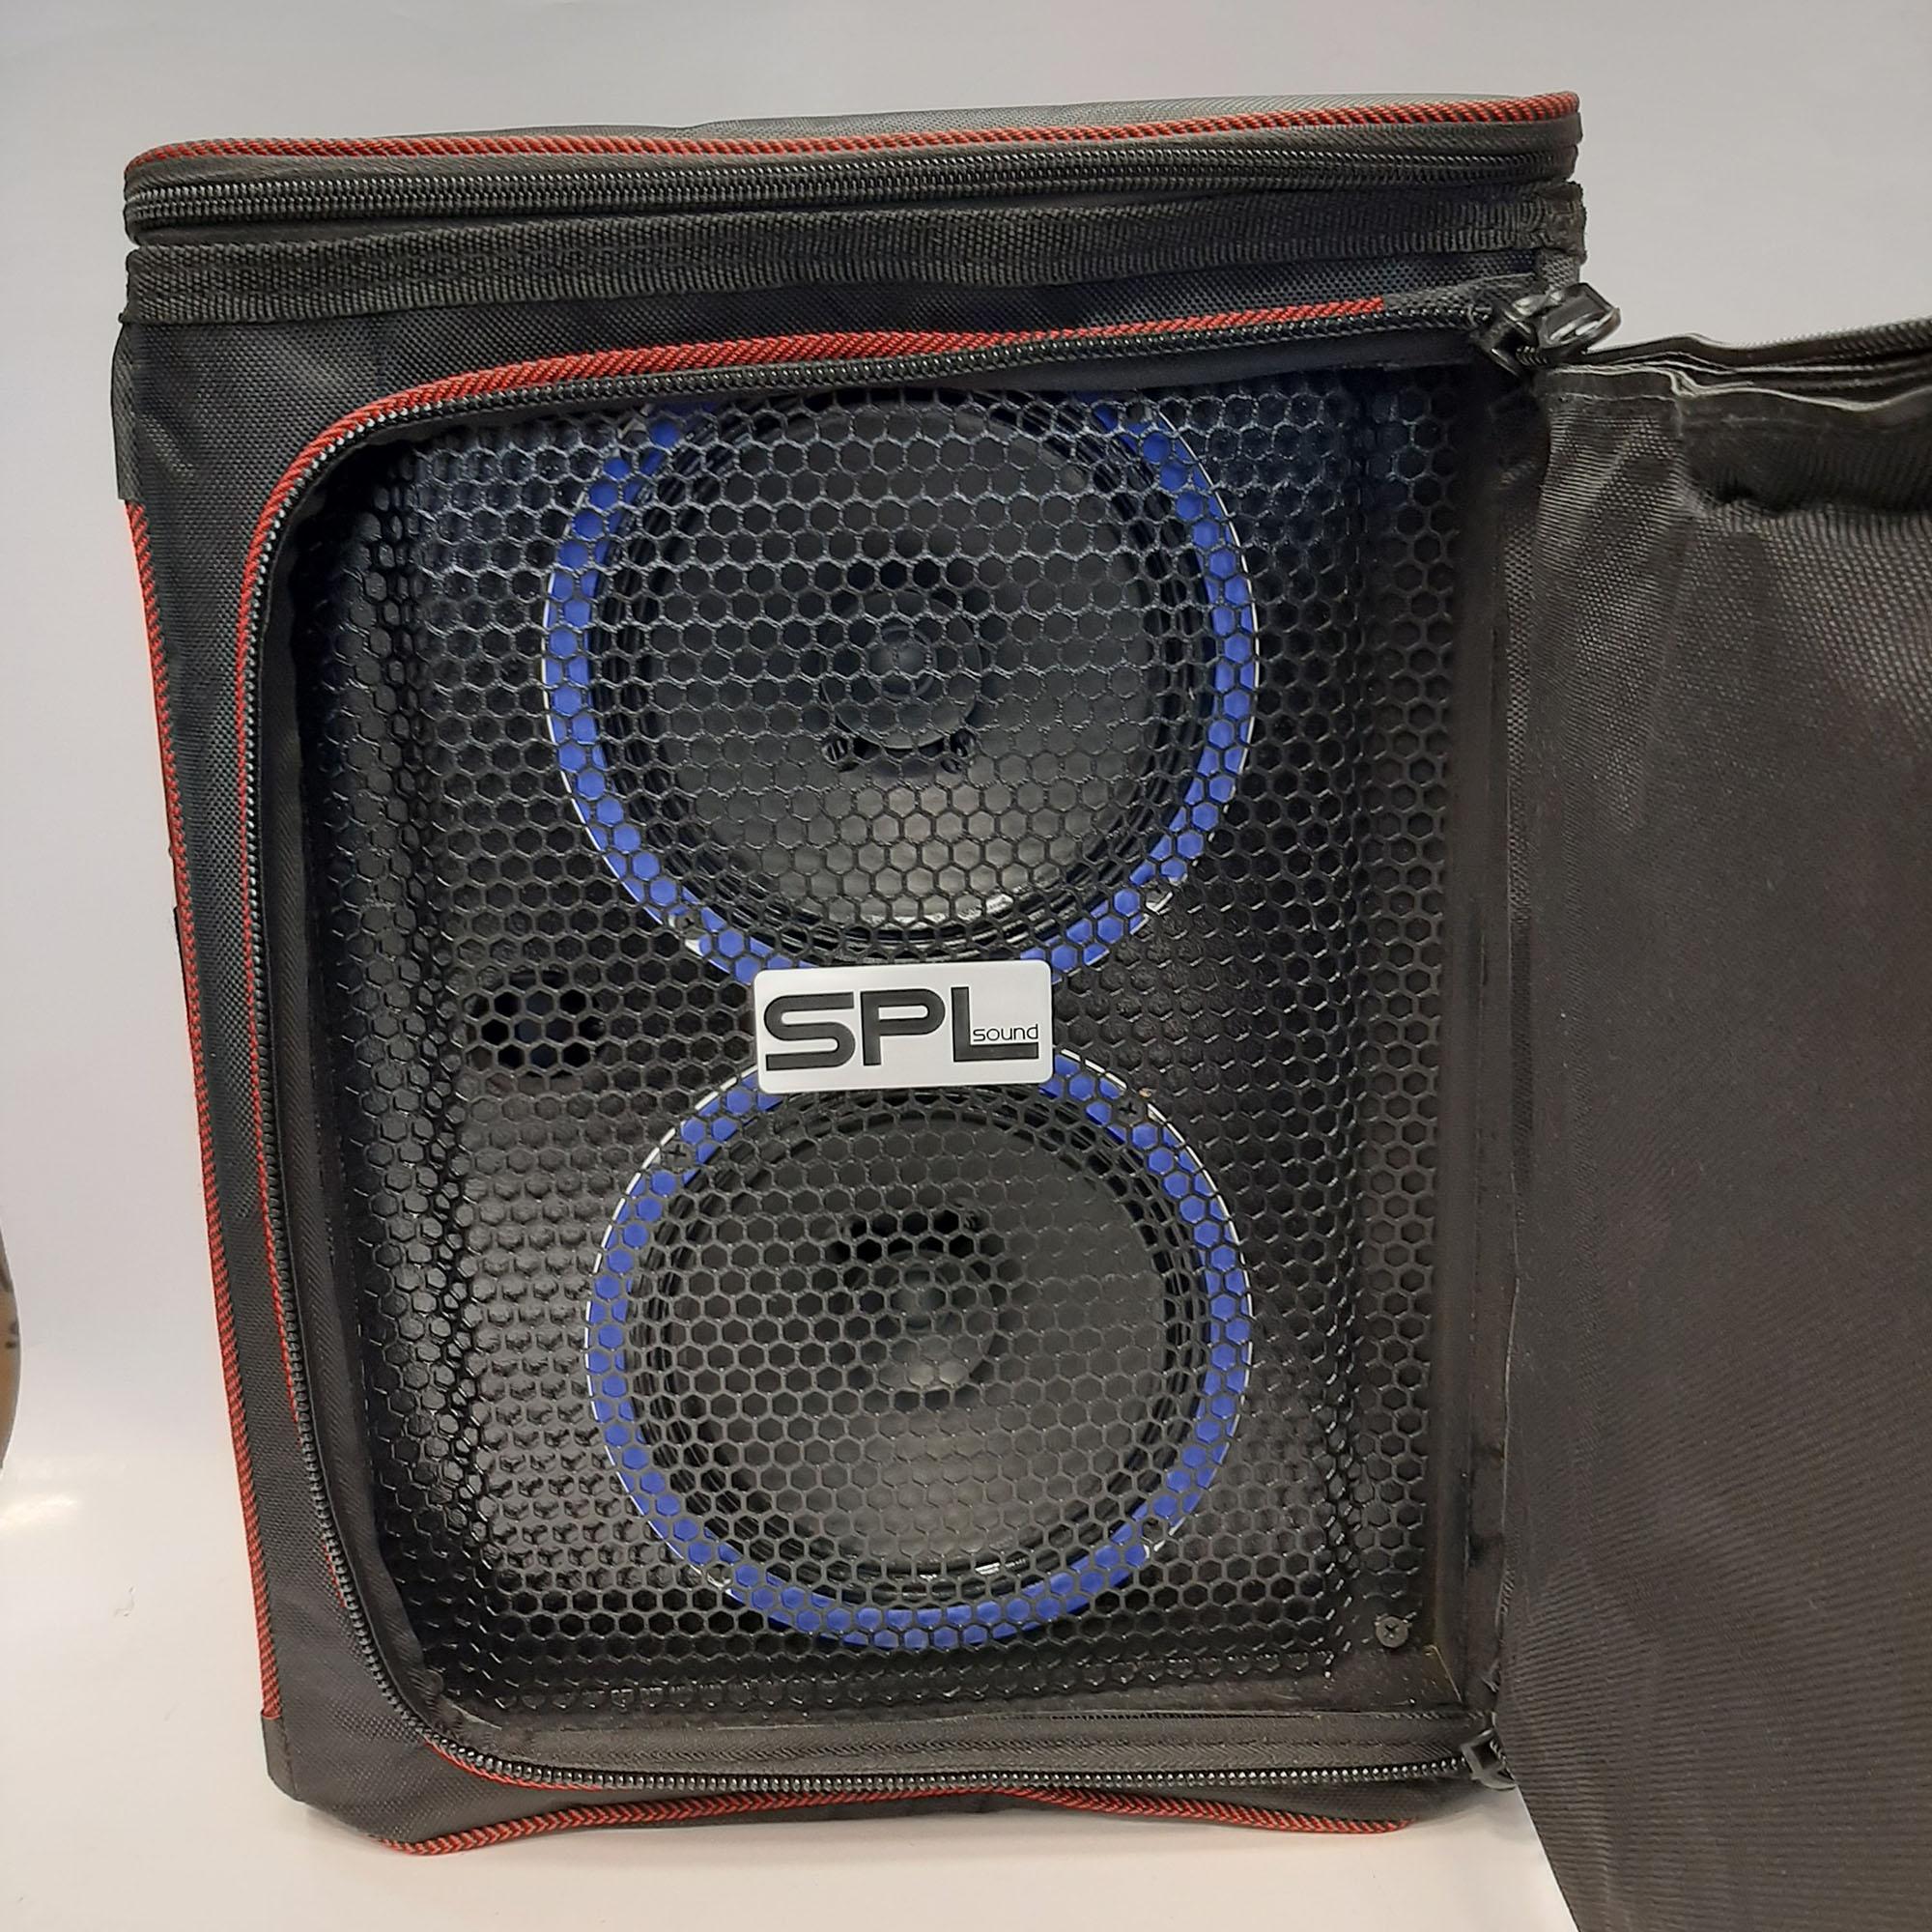 خرید اینترنتی اکو همراه شارژی اس پی ال مدل P&X-G15 اورجینال